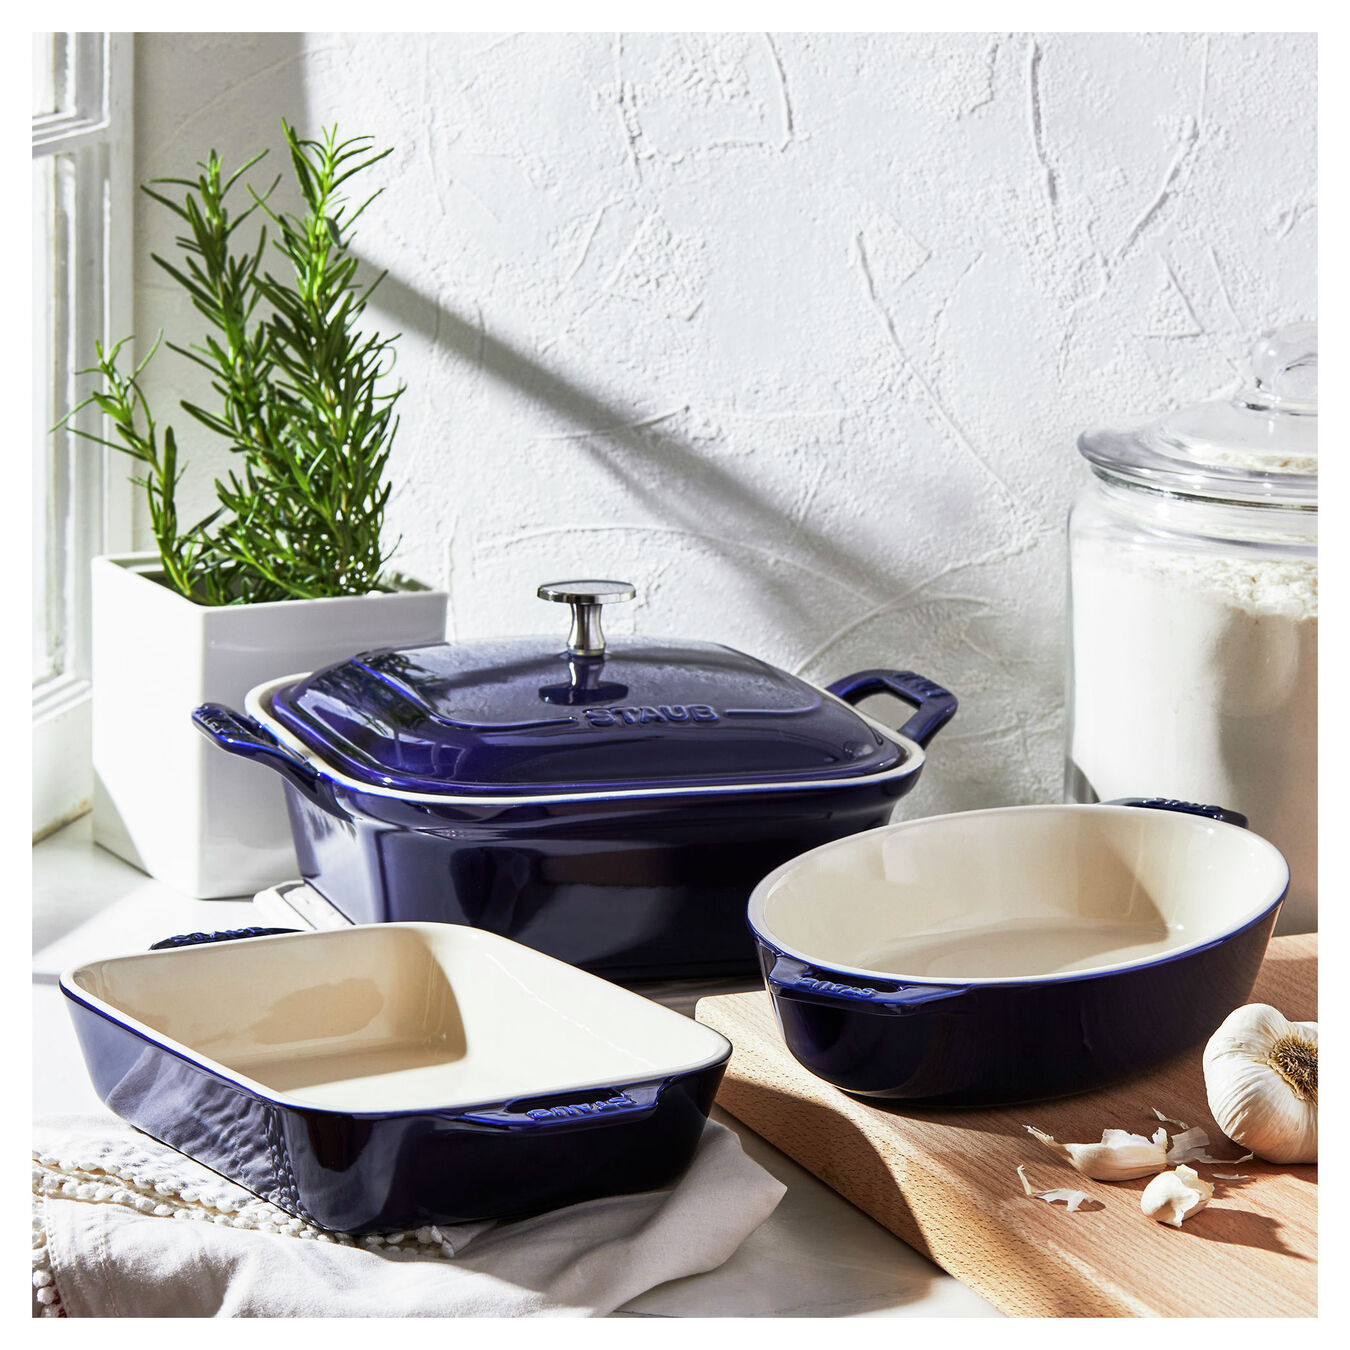 Ovenware set, 4 Piece | dark-blue,,large 6